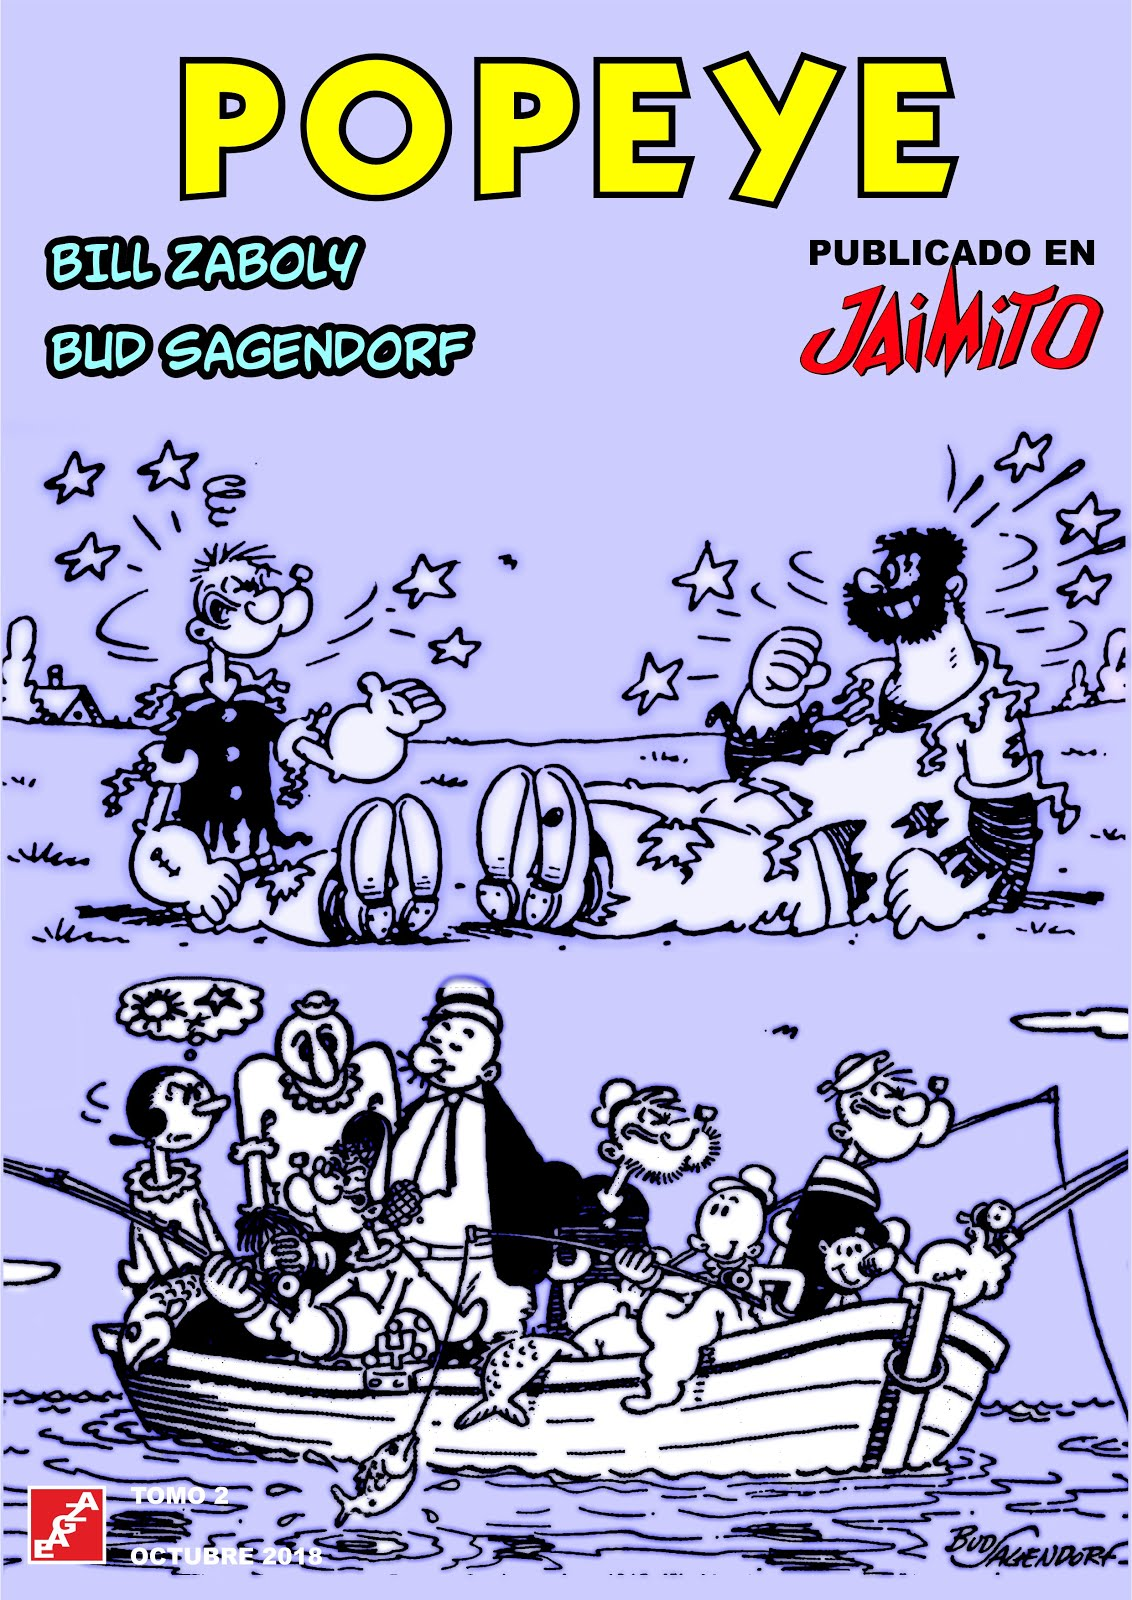 Popeye en Jaimito - 2 Tomos - B. Záboly - B. Sagendorf - EAGZA